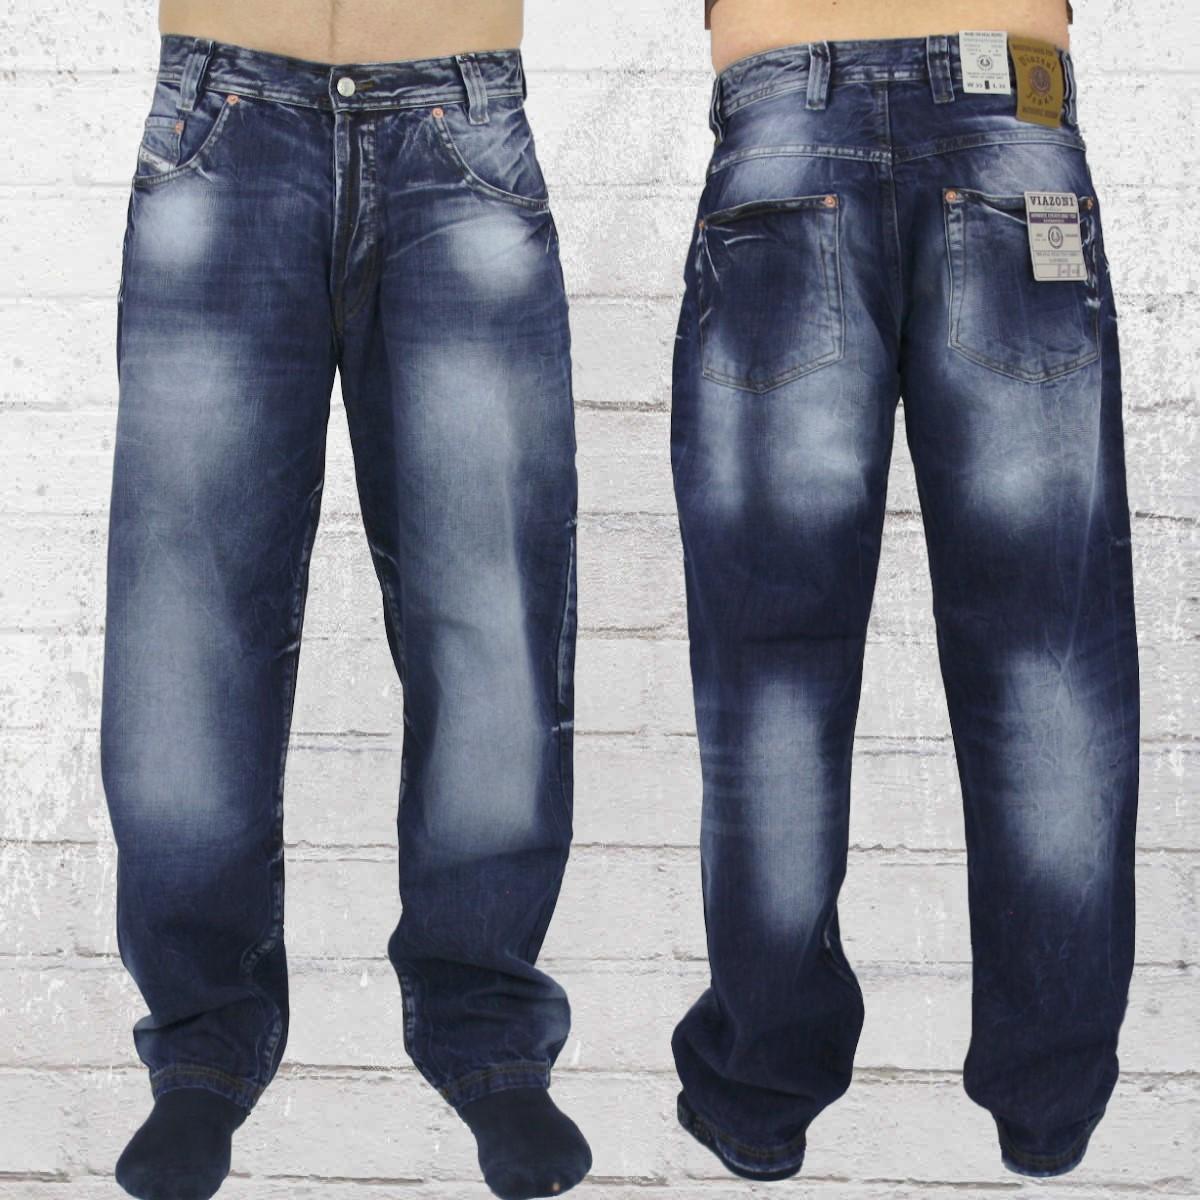 jetzt bestellen viazoni jeans hose herren raul karotte dark denim krasse. Black Bedroom Furniture Sets. Home Design Ideas